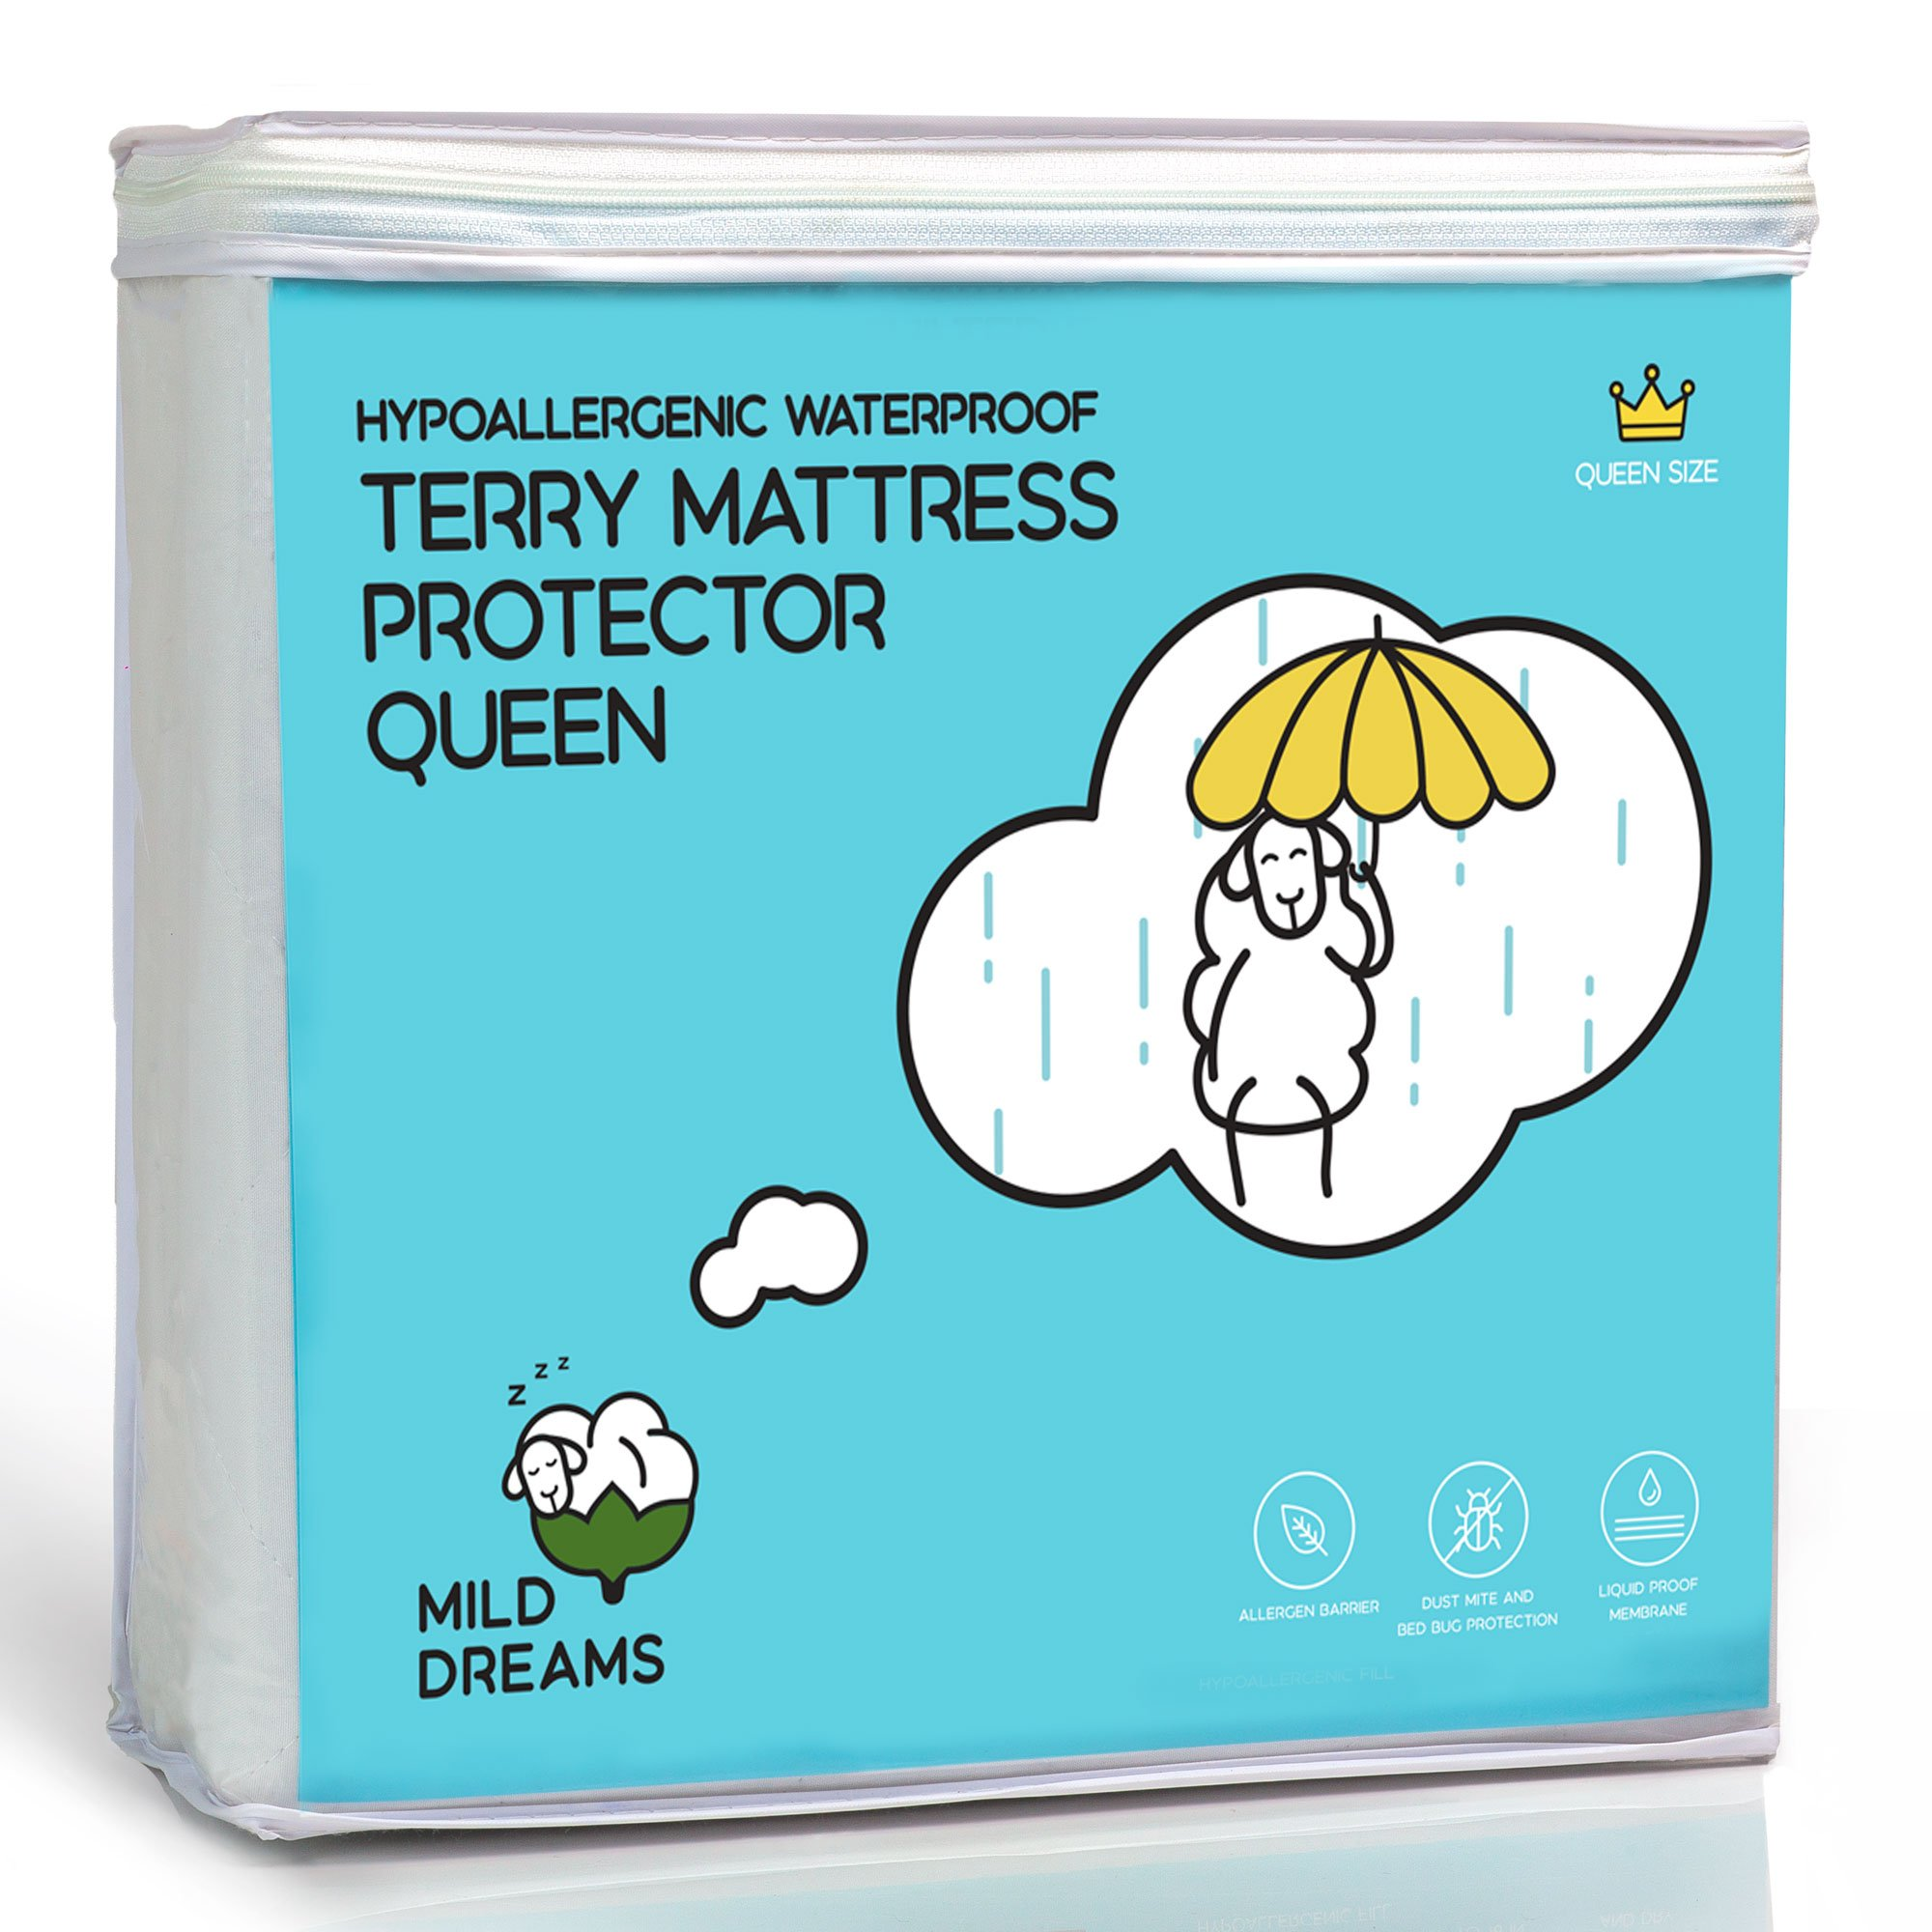 Milddreams Waterproof Mattress Protector Pad Queen - Plastic Bed Cover - Waterproof Fitted Sheet - Queen size (60x80+18 inch Deep Pocket) - Hypoallergenic - Vinyl Free - 10 Year Warranty